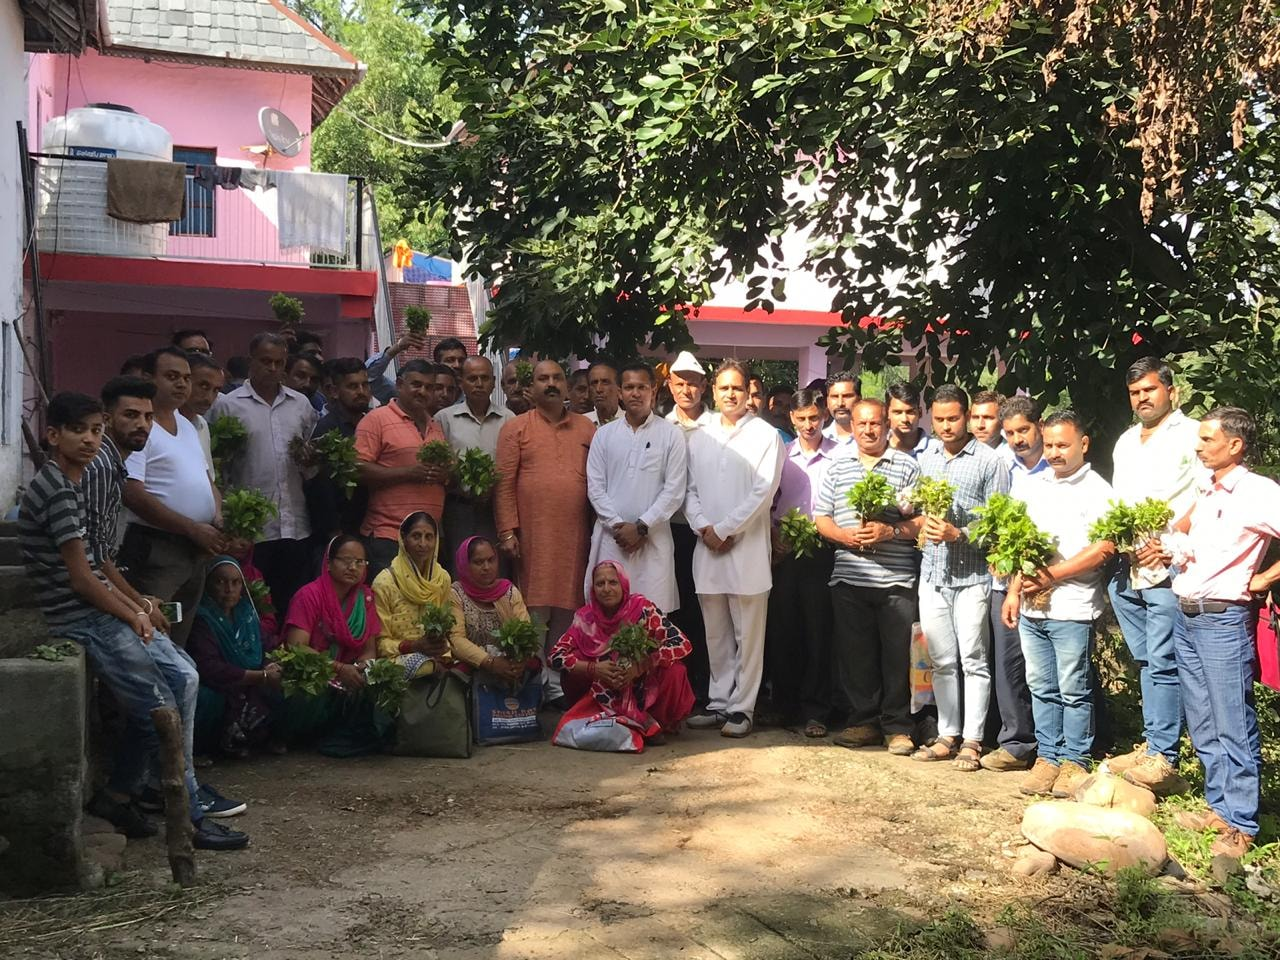 Himachal Man is distributing free coffee saplings